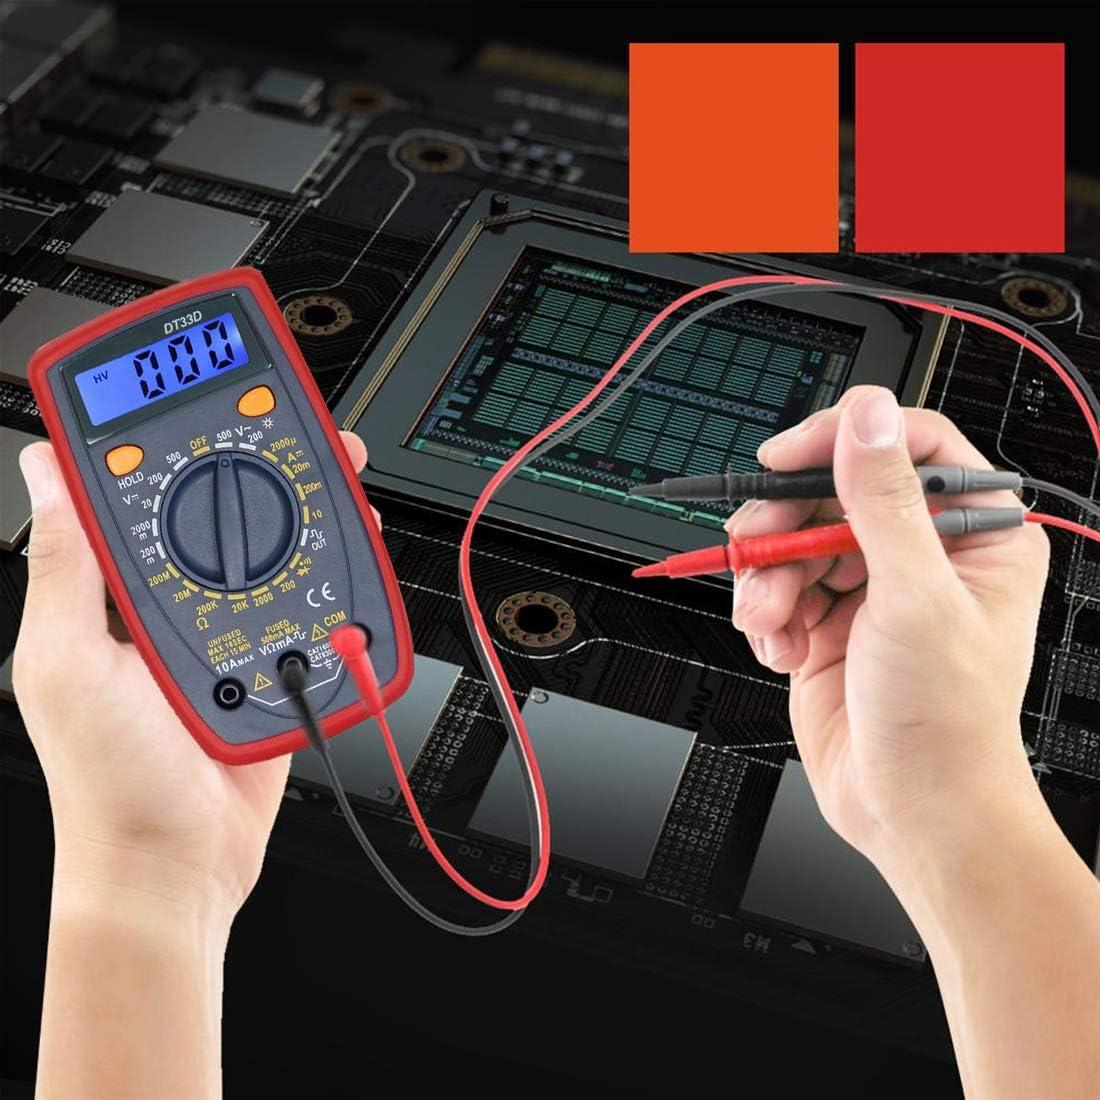 Ampere Vitorhytech Digital Multimeter with Ohm Volt Diode Voltage Tester DC Current Measures AC//DC Voltage Resistance Continuity Measuring Instrument with Backlight